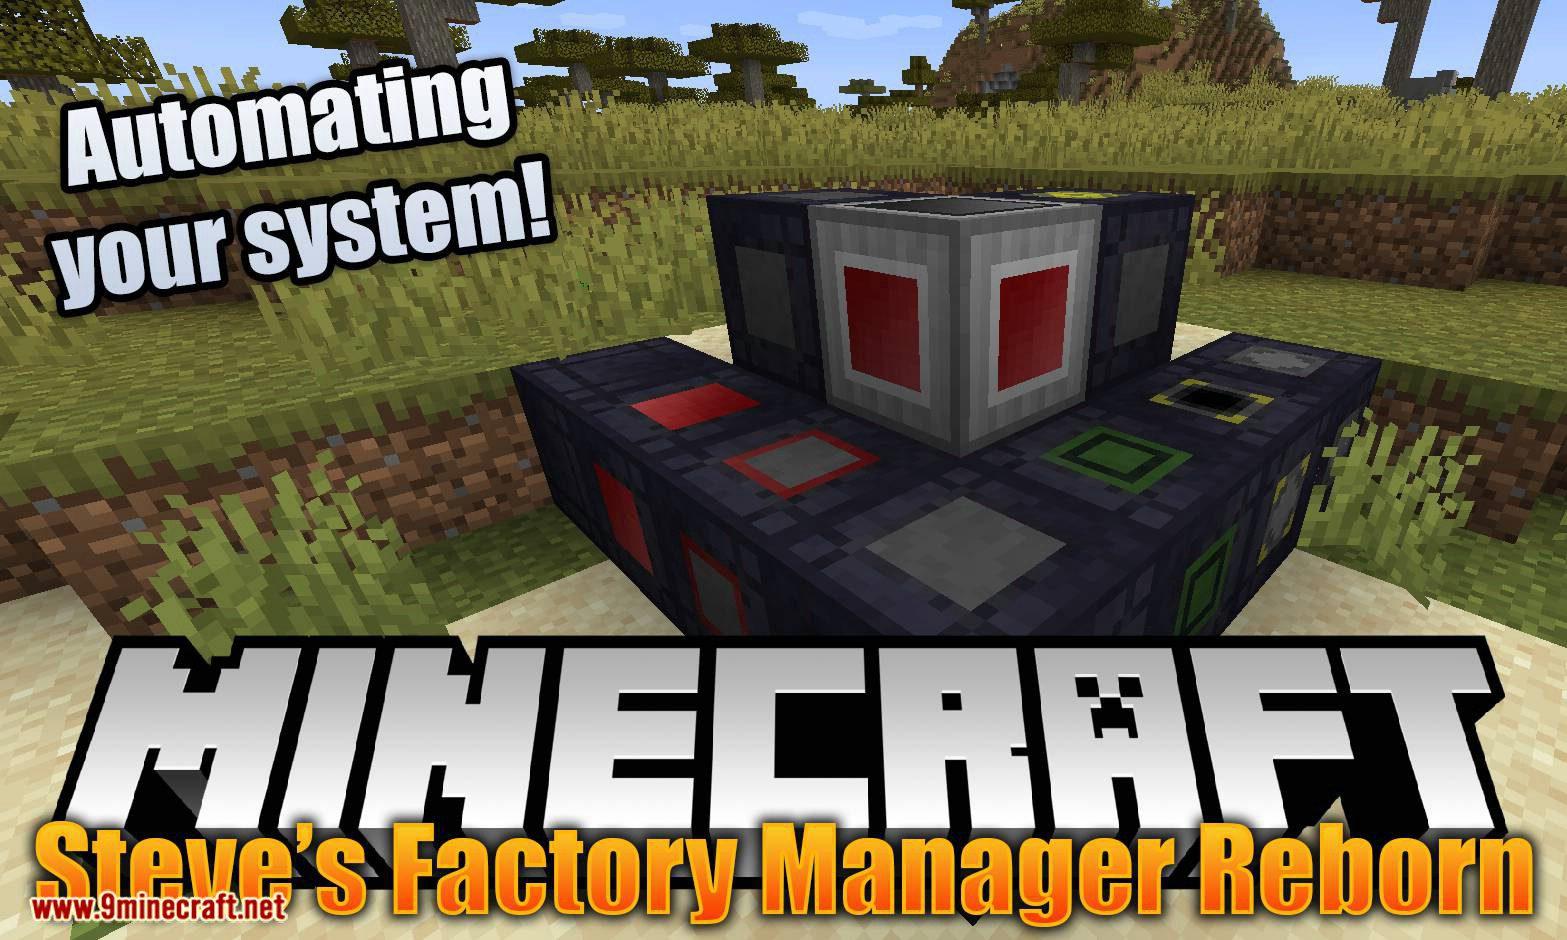 Steve_s Factory Manager Reborn mod for minecraft logo